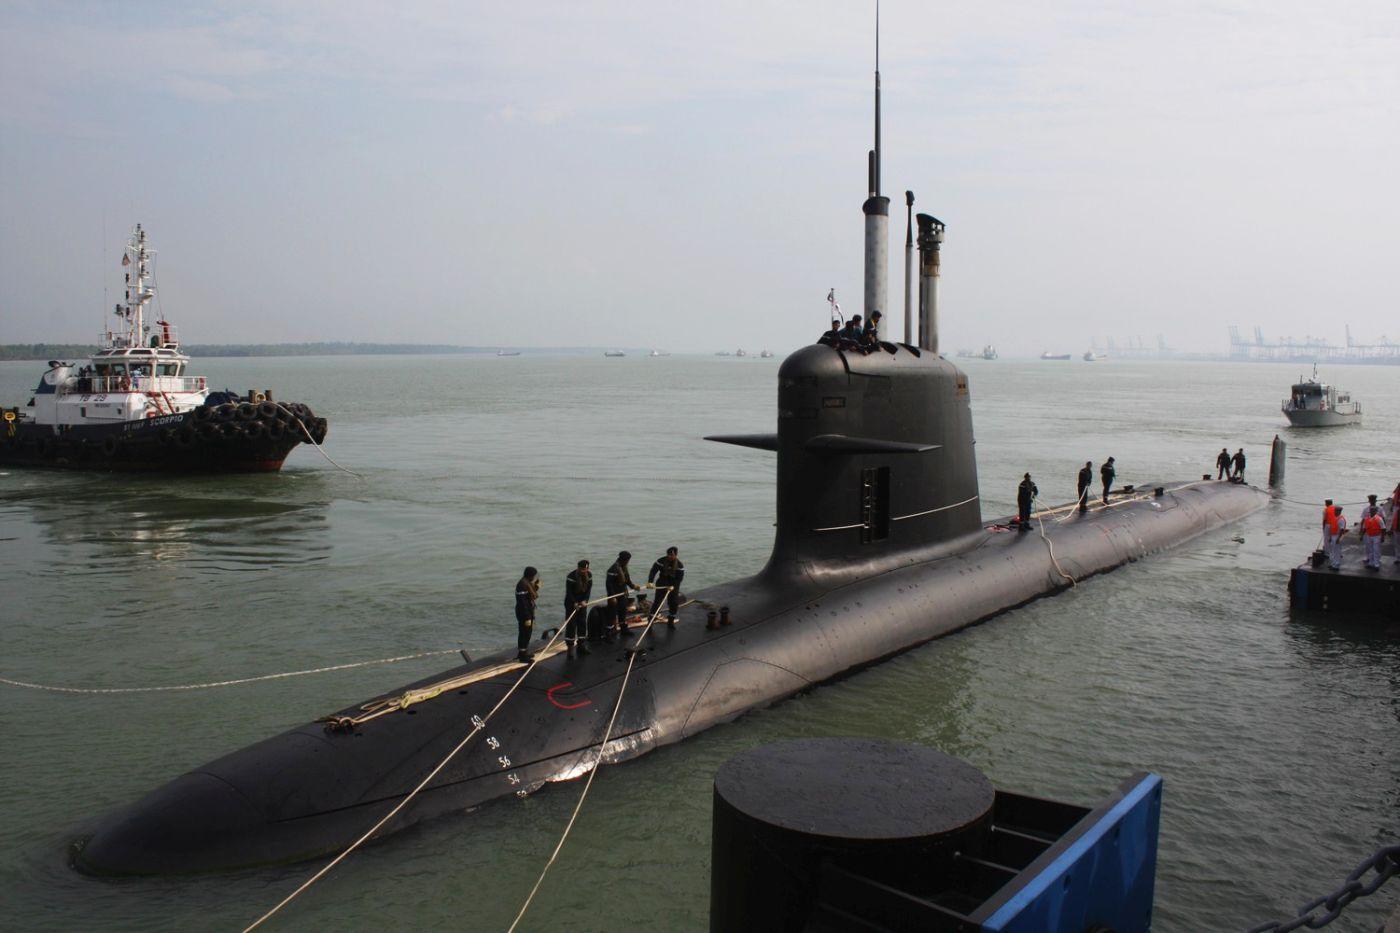 nowe okręty podwodne | Tunku Abdul Rahman, malezyjski okręt typu Scorpène (fot. Mak Hon Keong, Creative Commons Attribution-Share Alike 3.0 Unported)